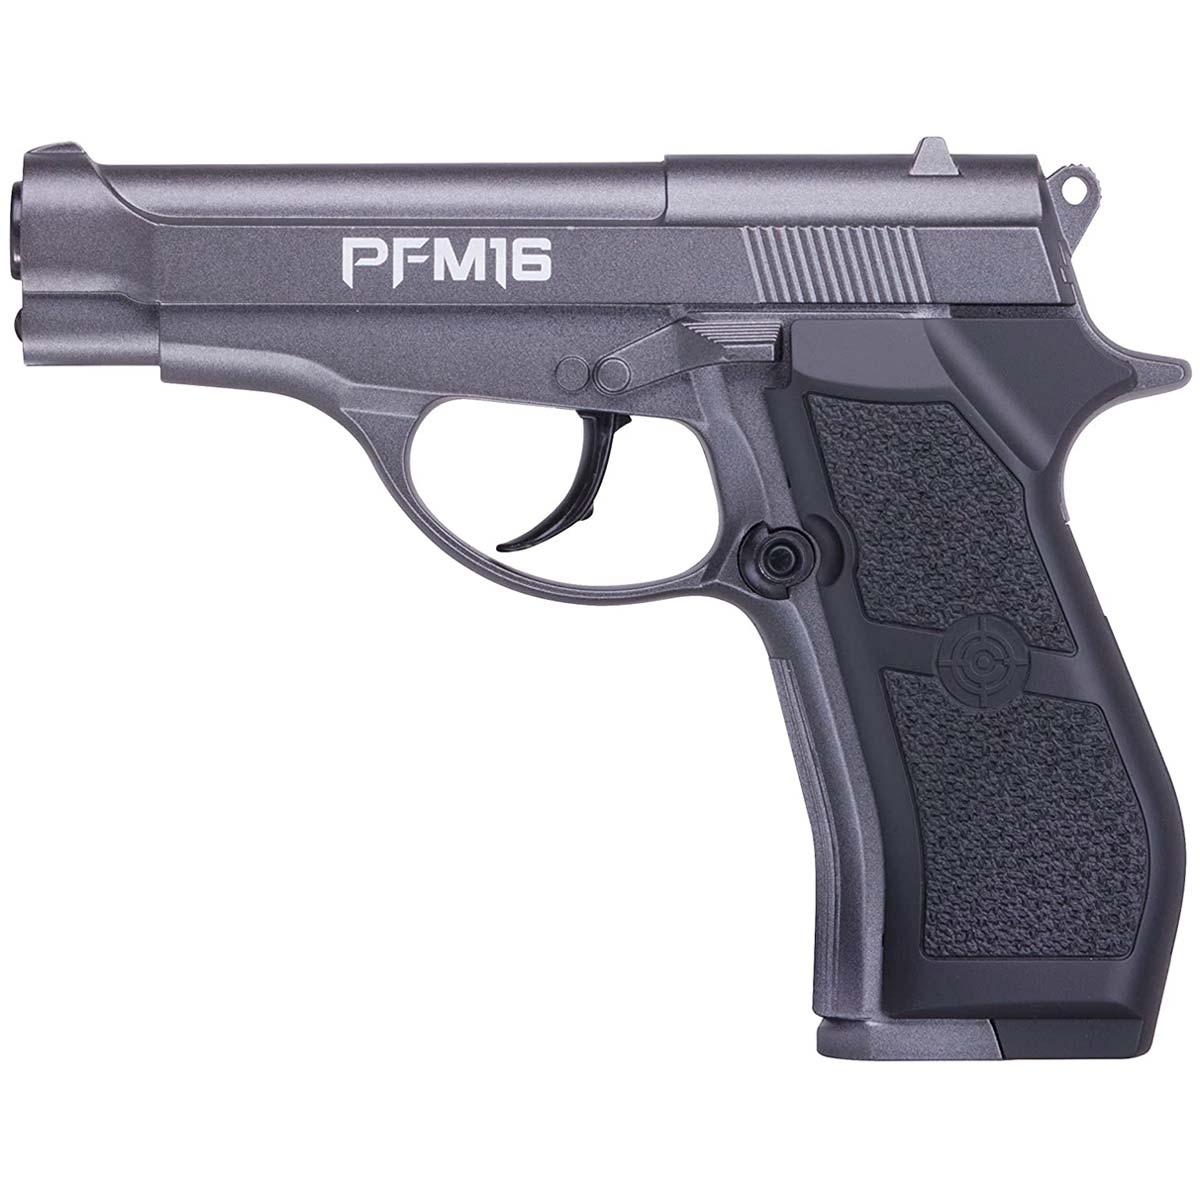 Pistola Metal CO2 400 Pps Bbs Cal 4.5 Tiro Deportivo Crosman